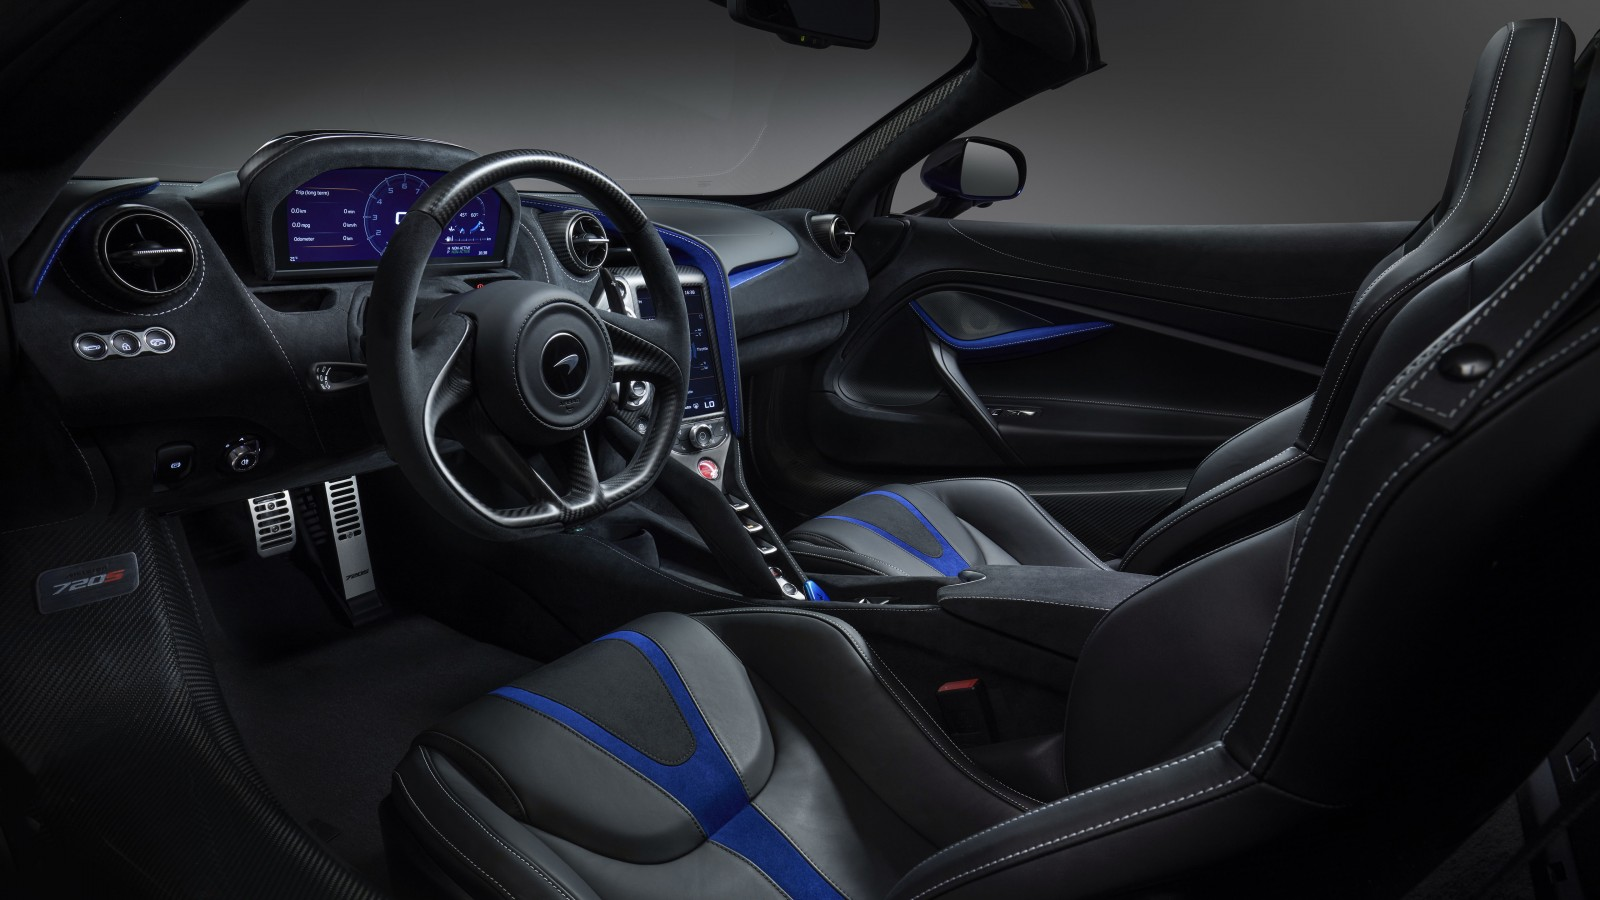 Mclaren S Spider By Mso Geneva Interior K X on Black Alfa Romeo Spider